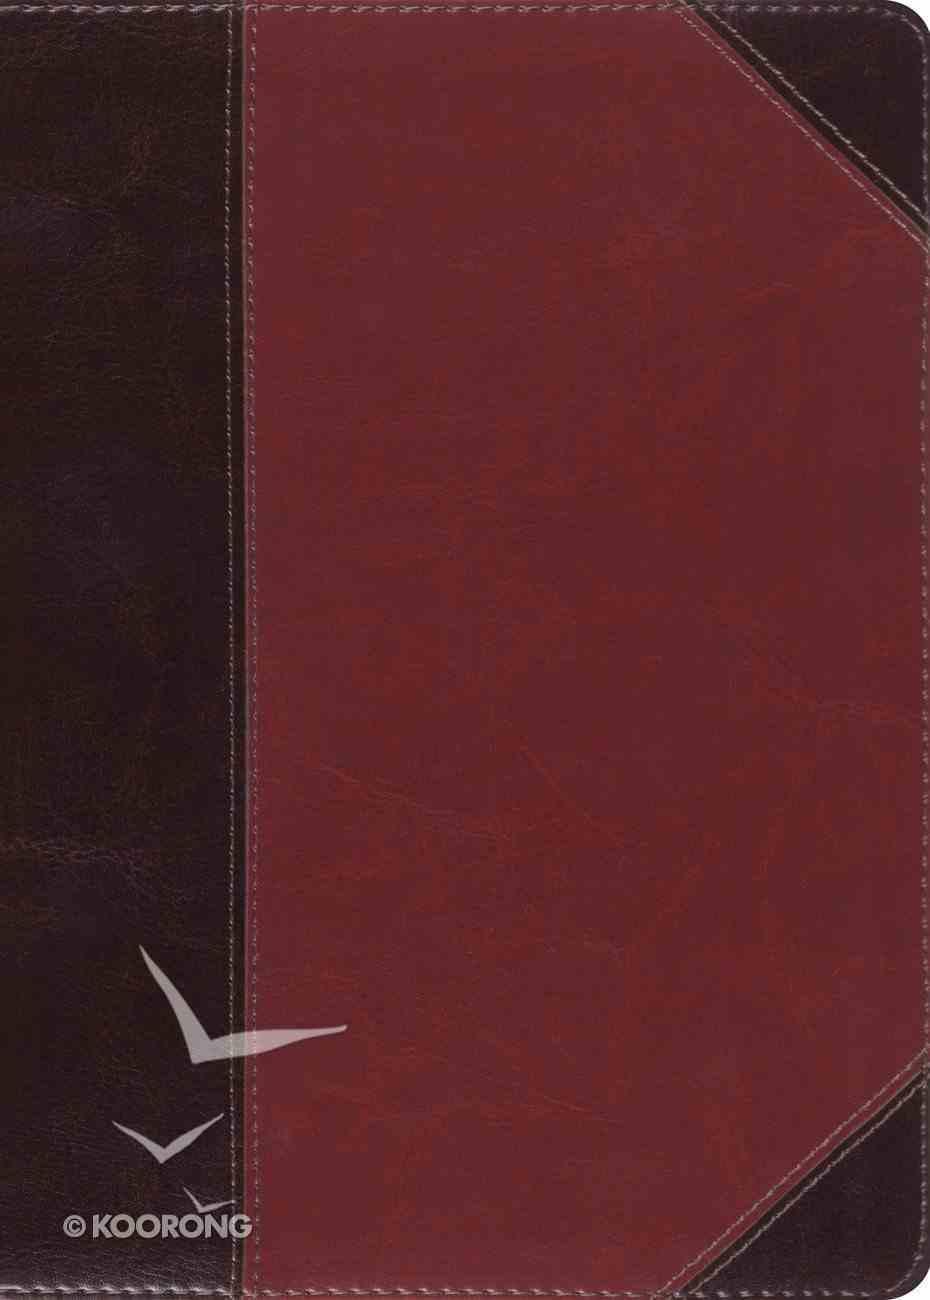 ESV Macarthur Study Bible Brown/Cordovan Portfolio Design (Black Letter Edition) Imitation Leather